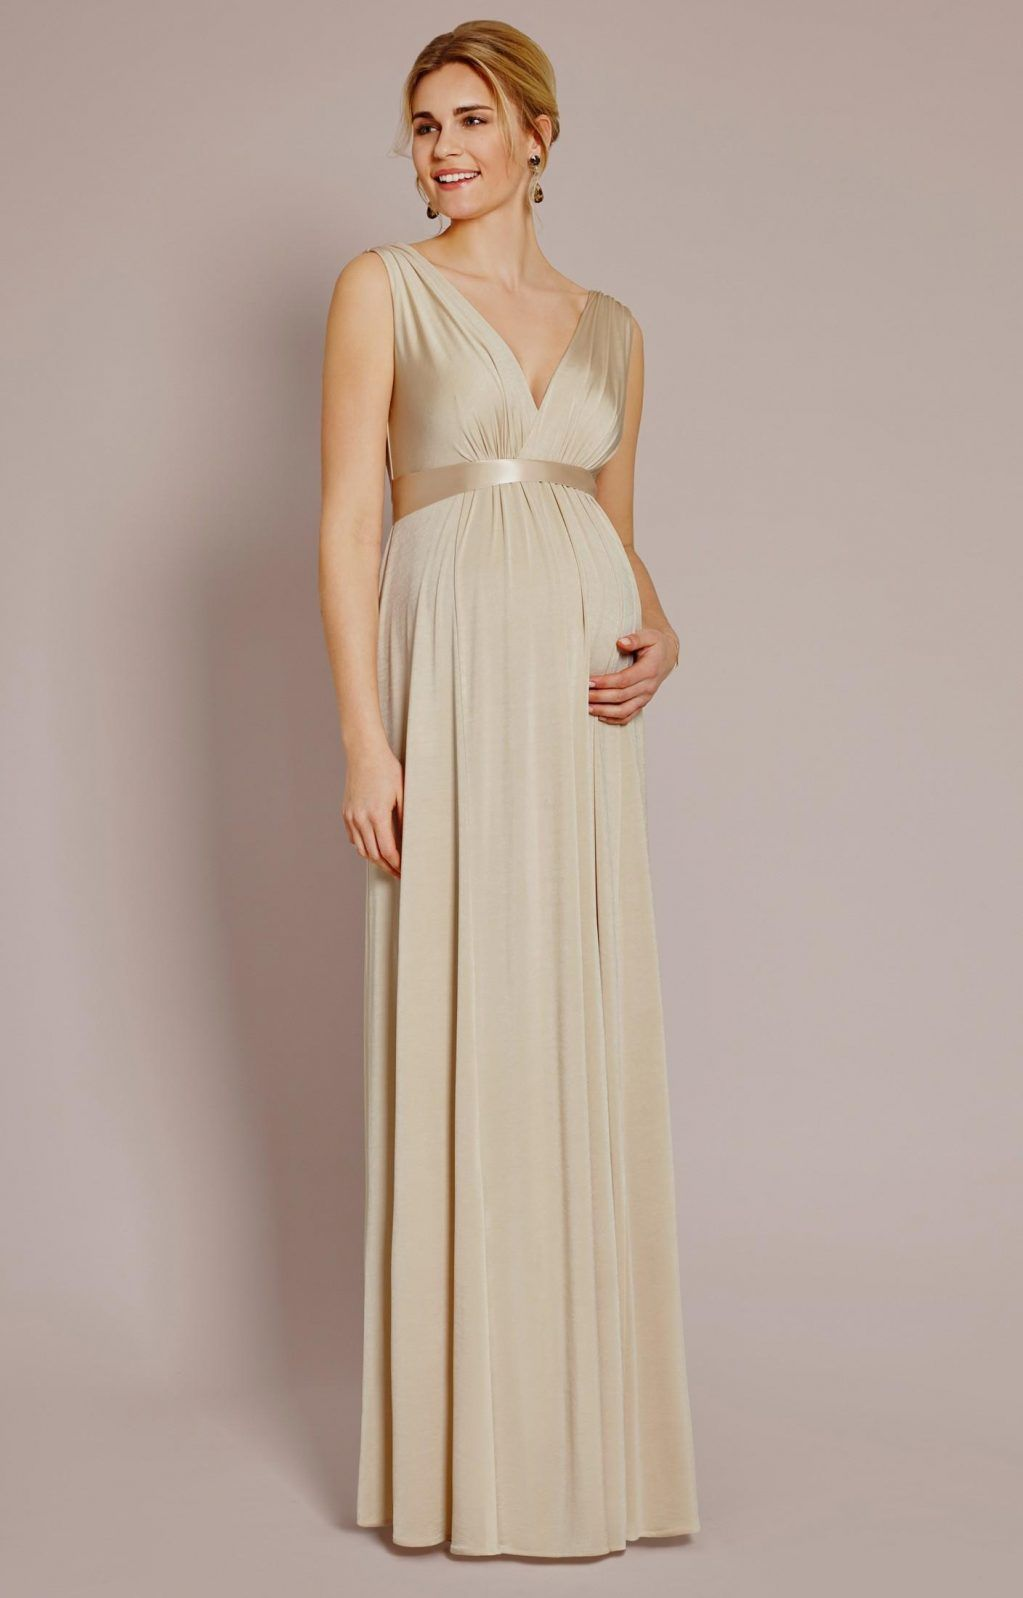 cbdabe32b148 wedding  Long Creamaternity Dress Naf Dresses Bridesmaid From Uk Designer  Tiffany Roseaxi For Wedding Guest Black Petite  Maxi Dress For Wedding Guest